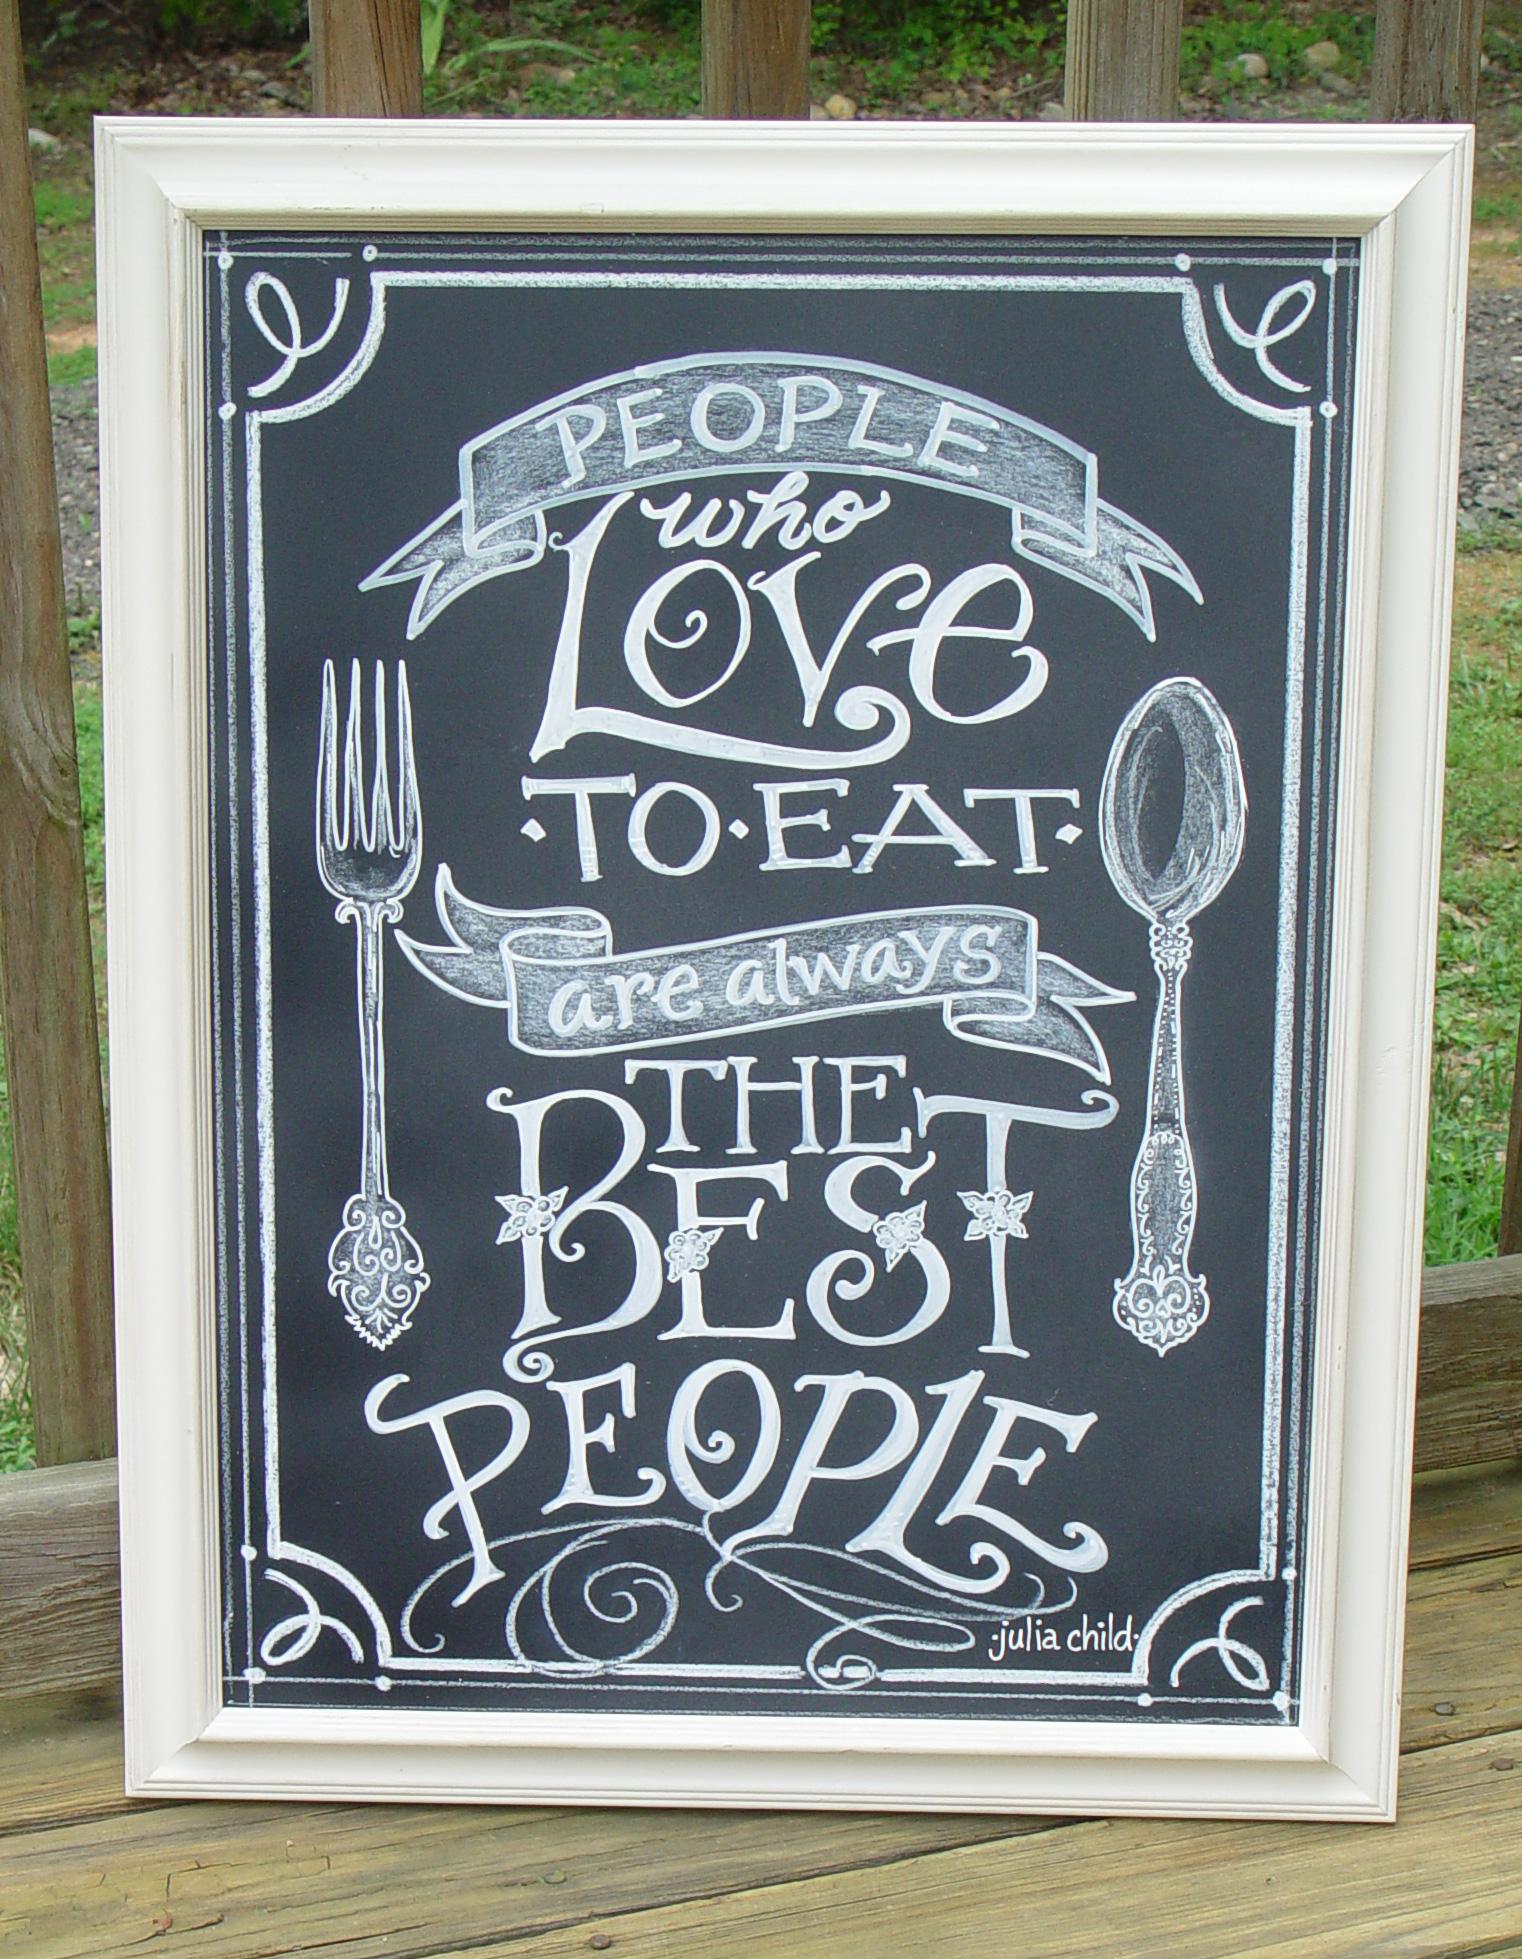 Stand Board Designs : Julia child quotes chalkboard art the watermelon stand